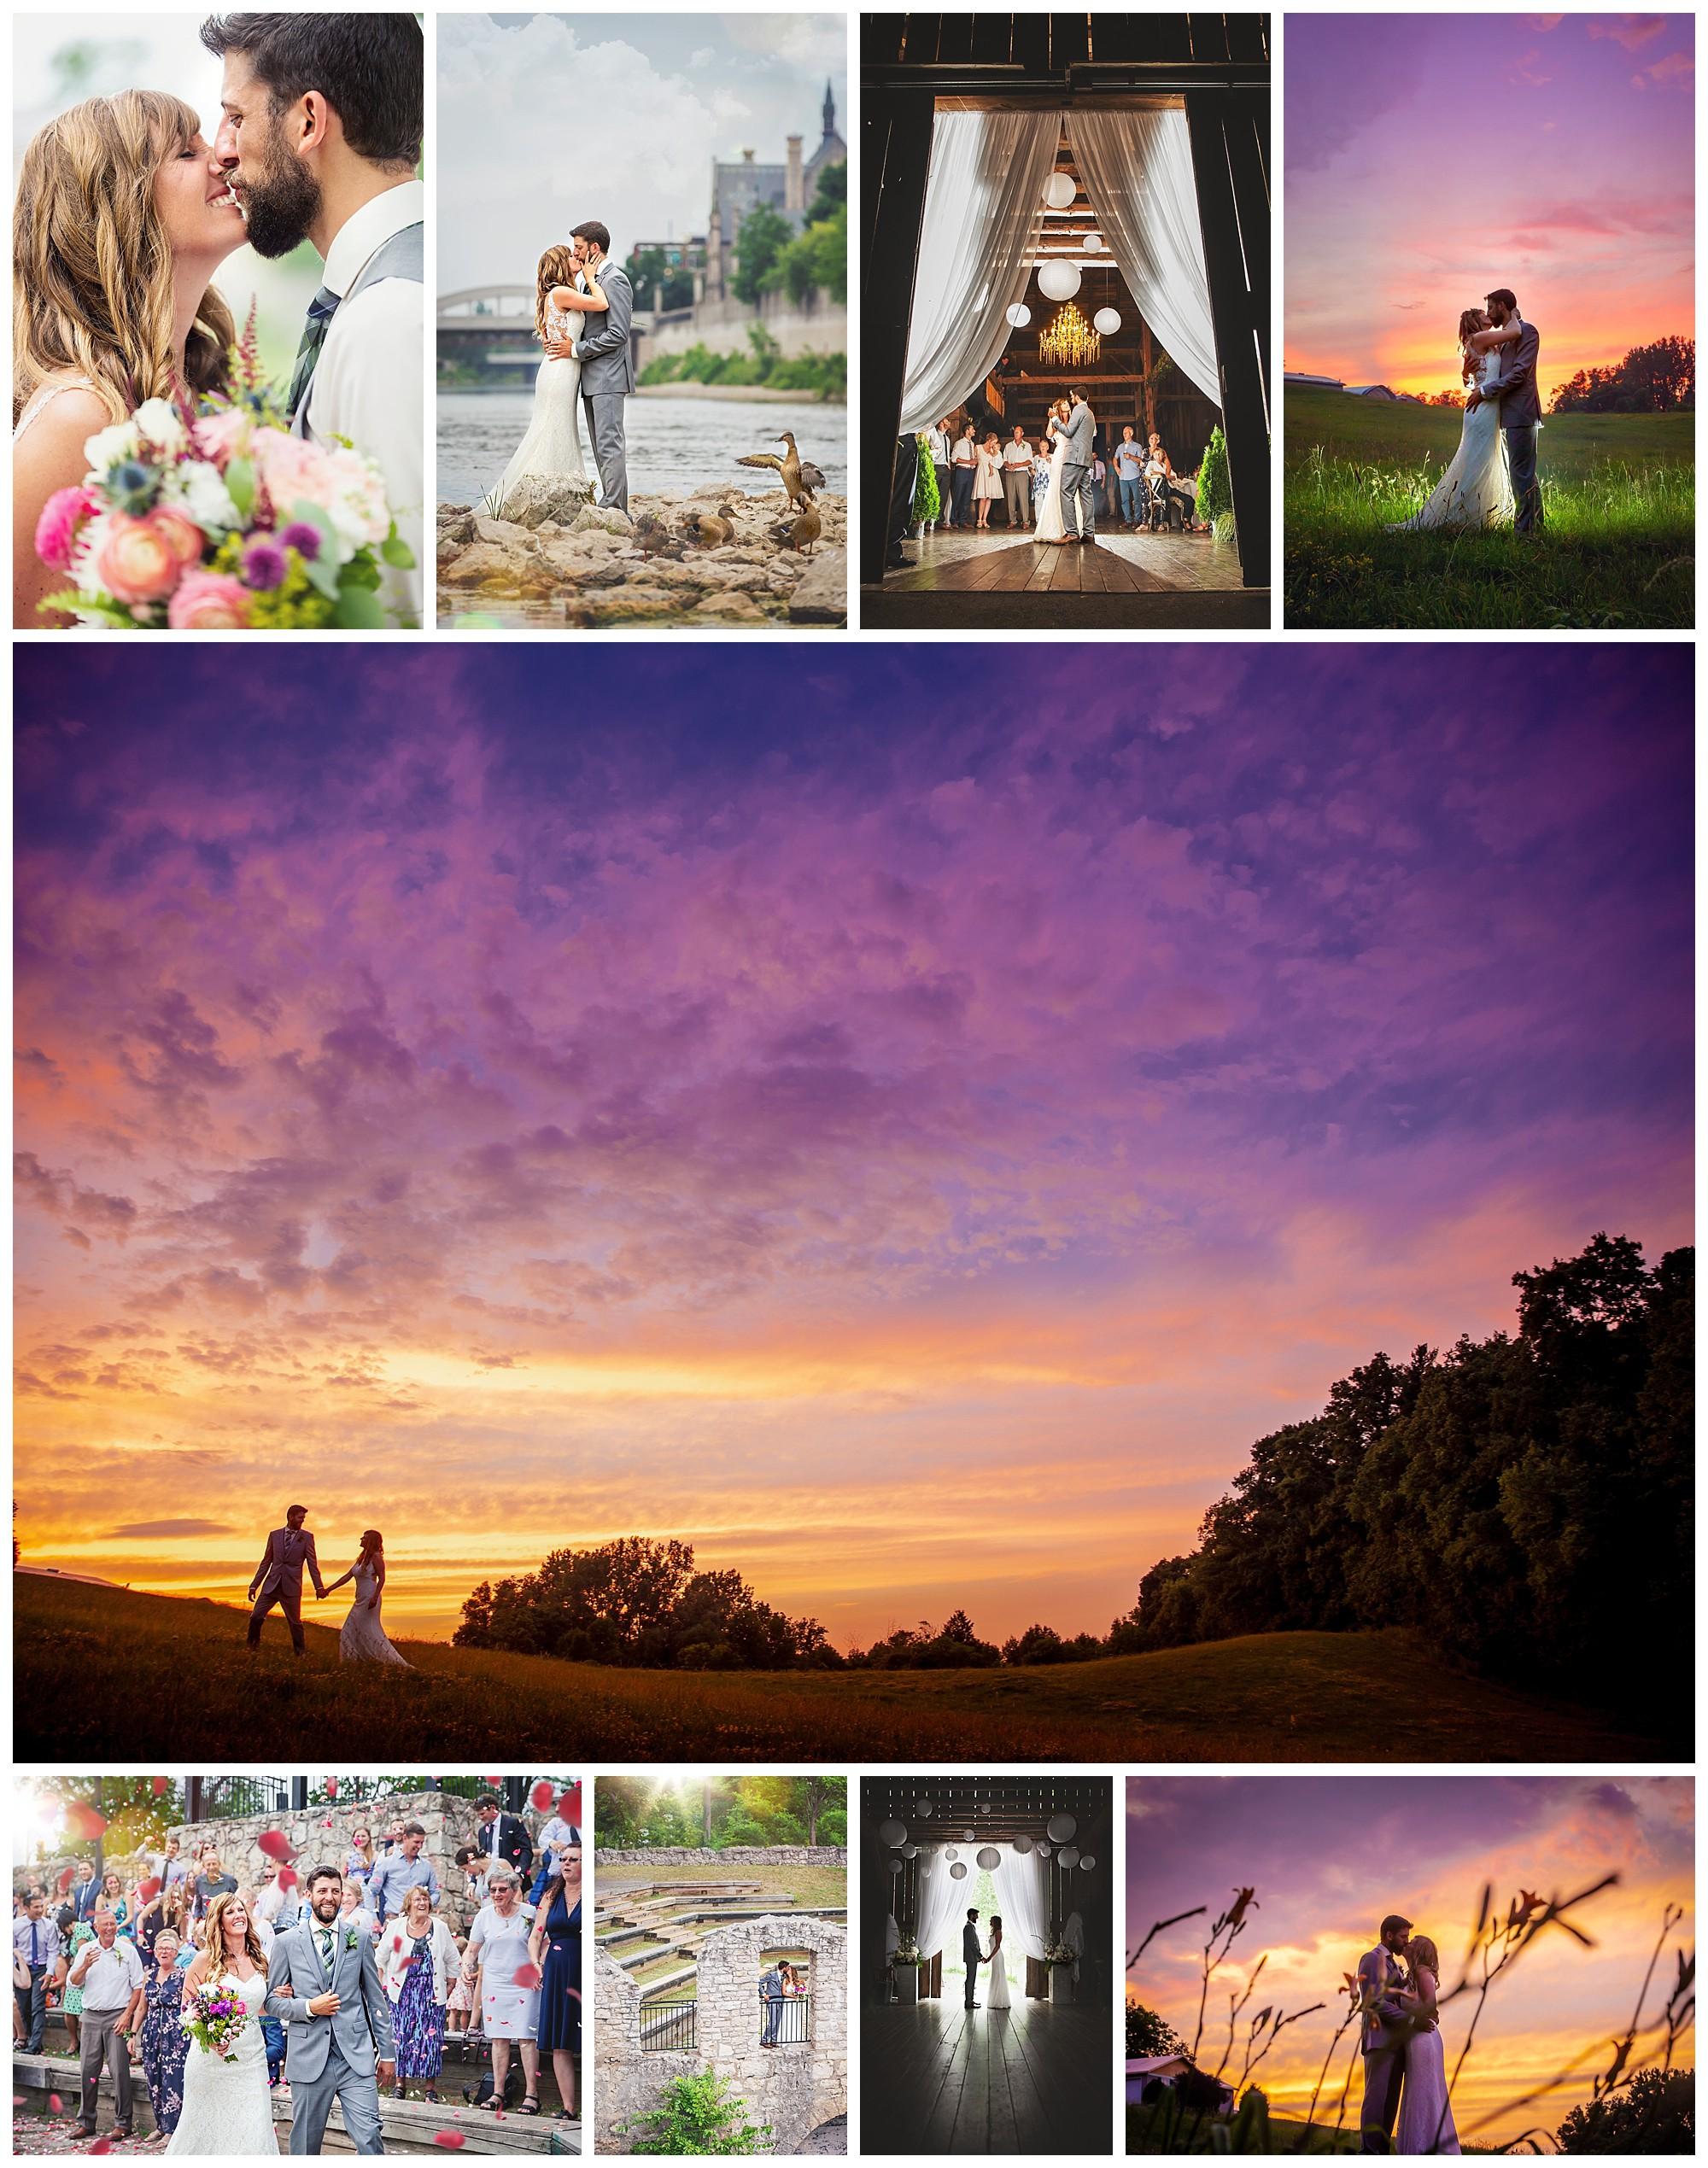 Cambridge Mill & Vicano Barn, Cambridge, Ontario wedding photos by VanDaele & Russell